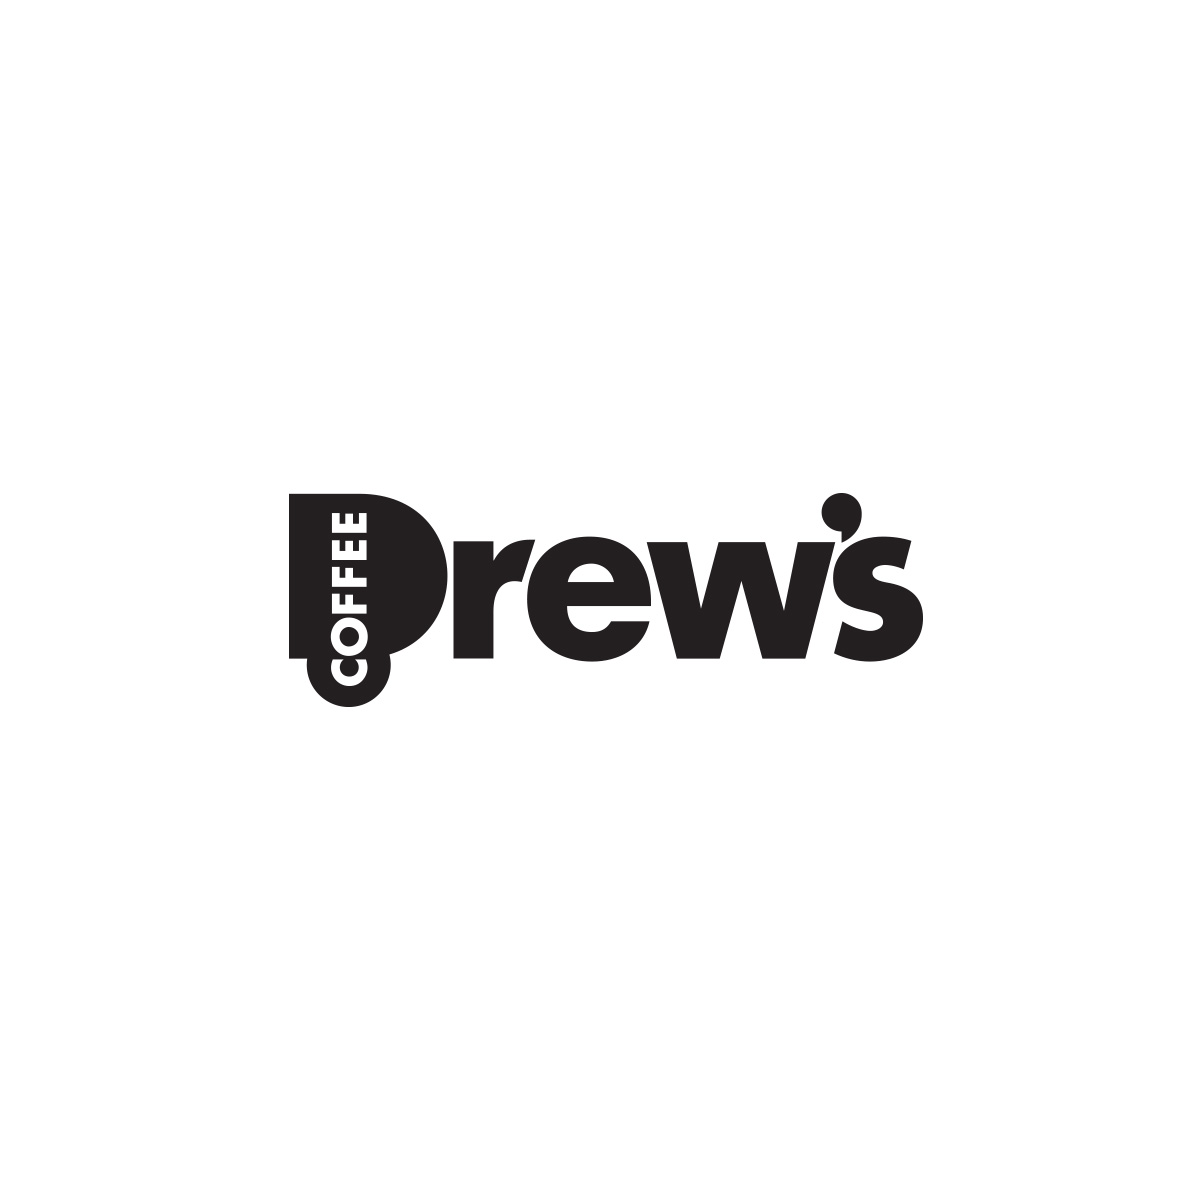 Drews_logo.jpg